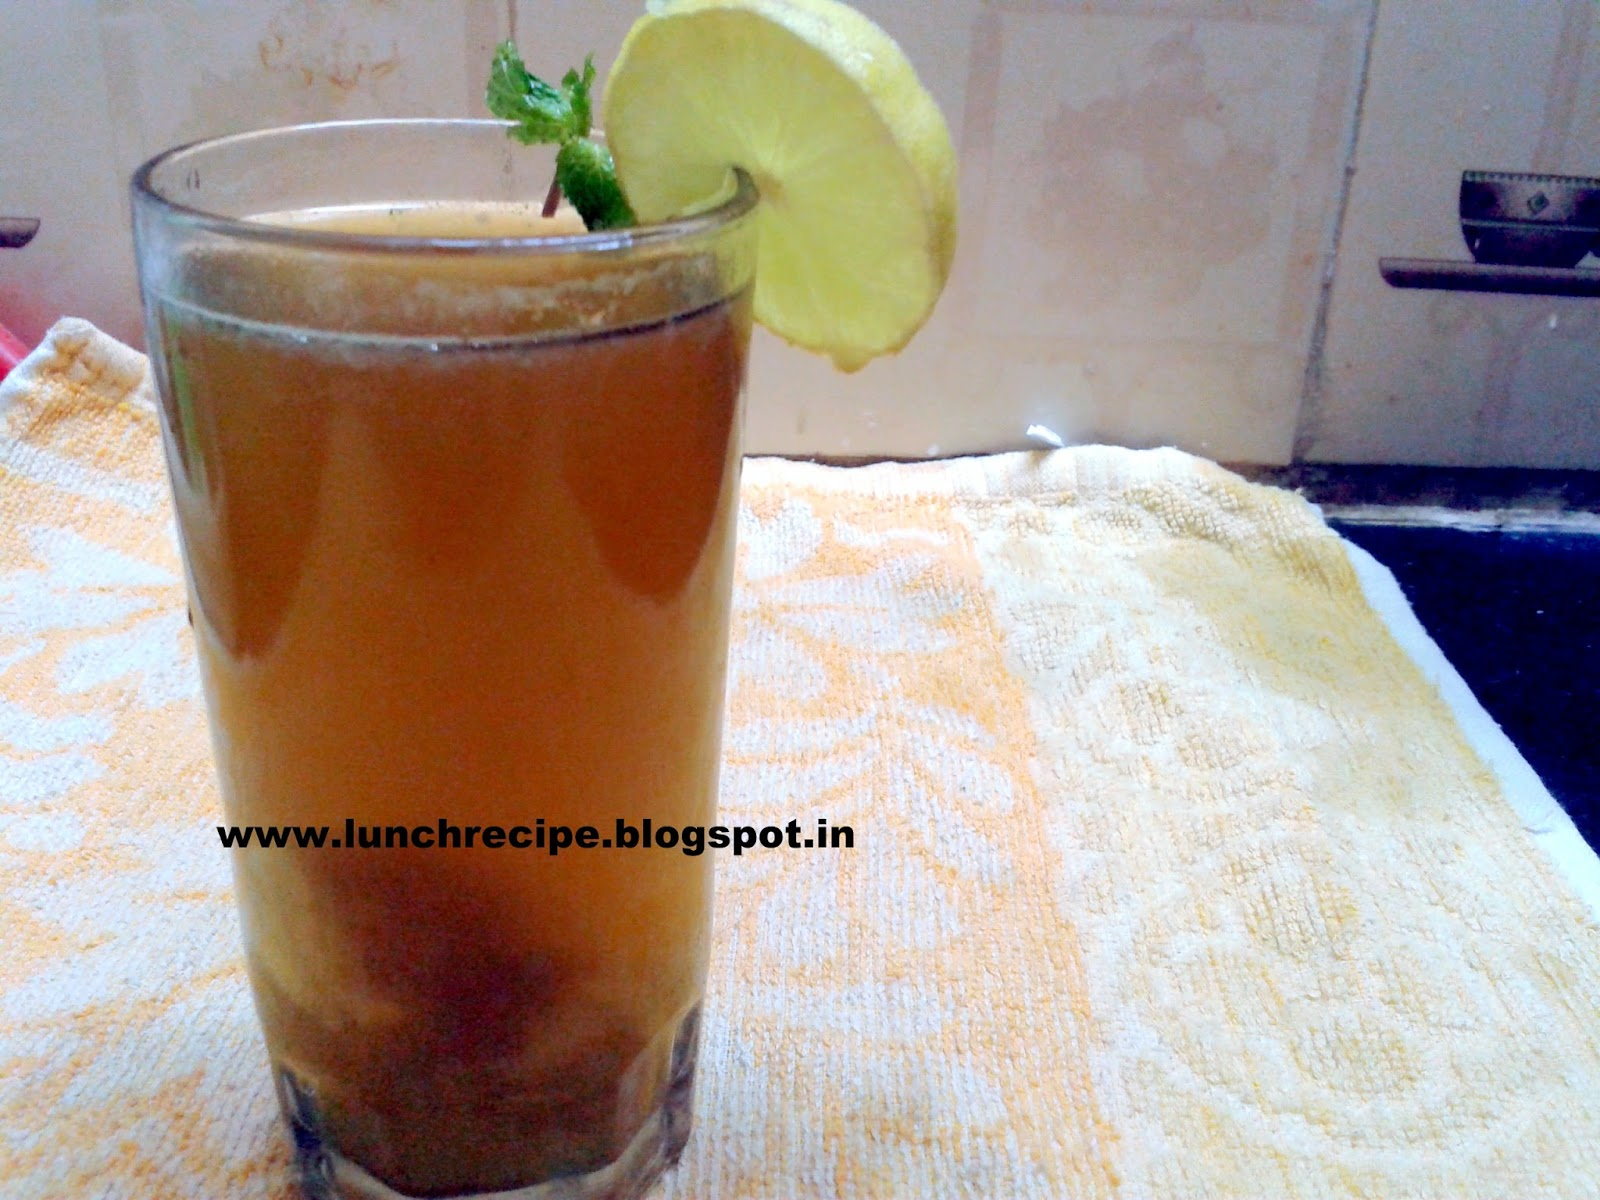 How to make Nimboo Adrak Pani | निम्बू अदरक पानी - Nimboo Adrak Pani Recipe | Nimbu Adrak Drink